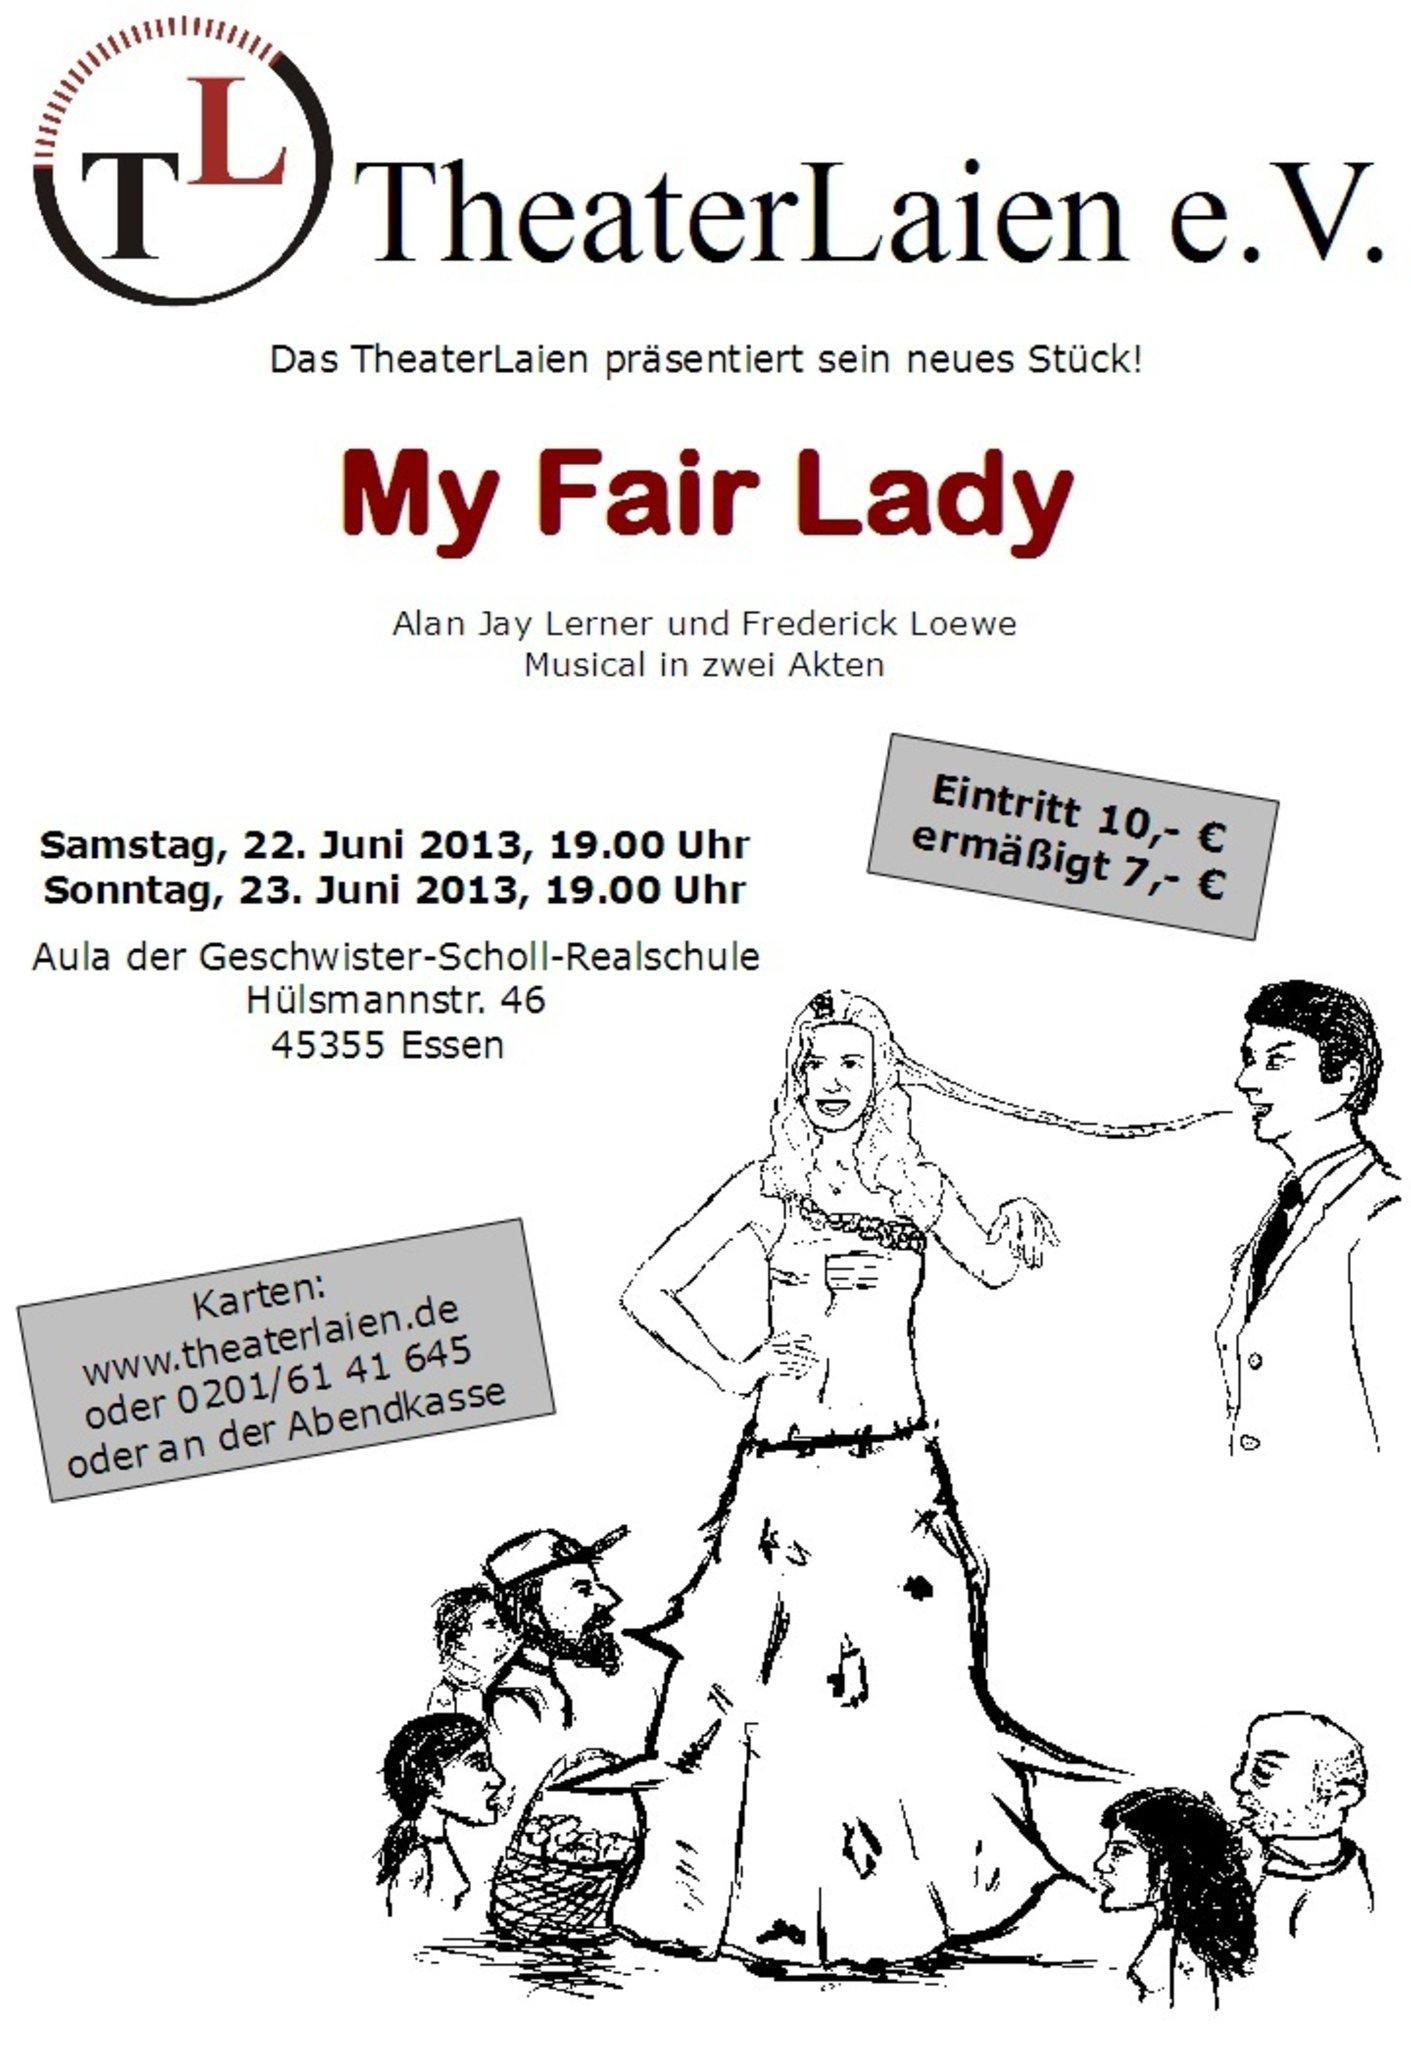 My Fair Lady Essen